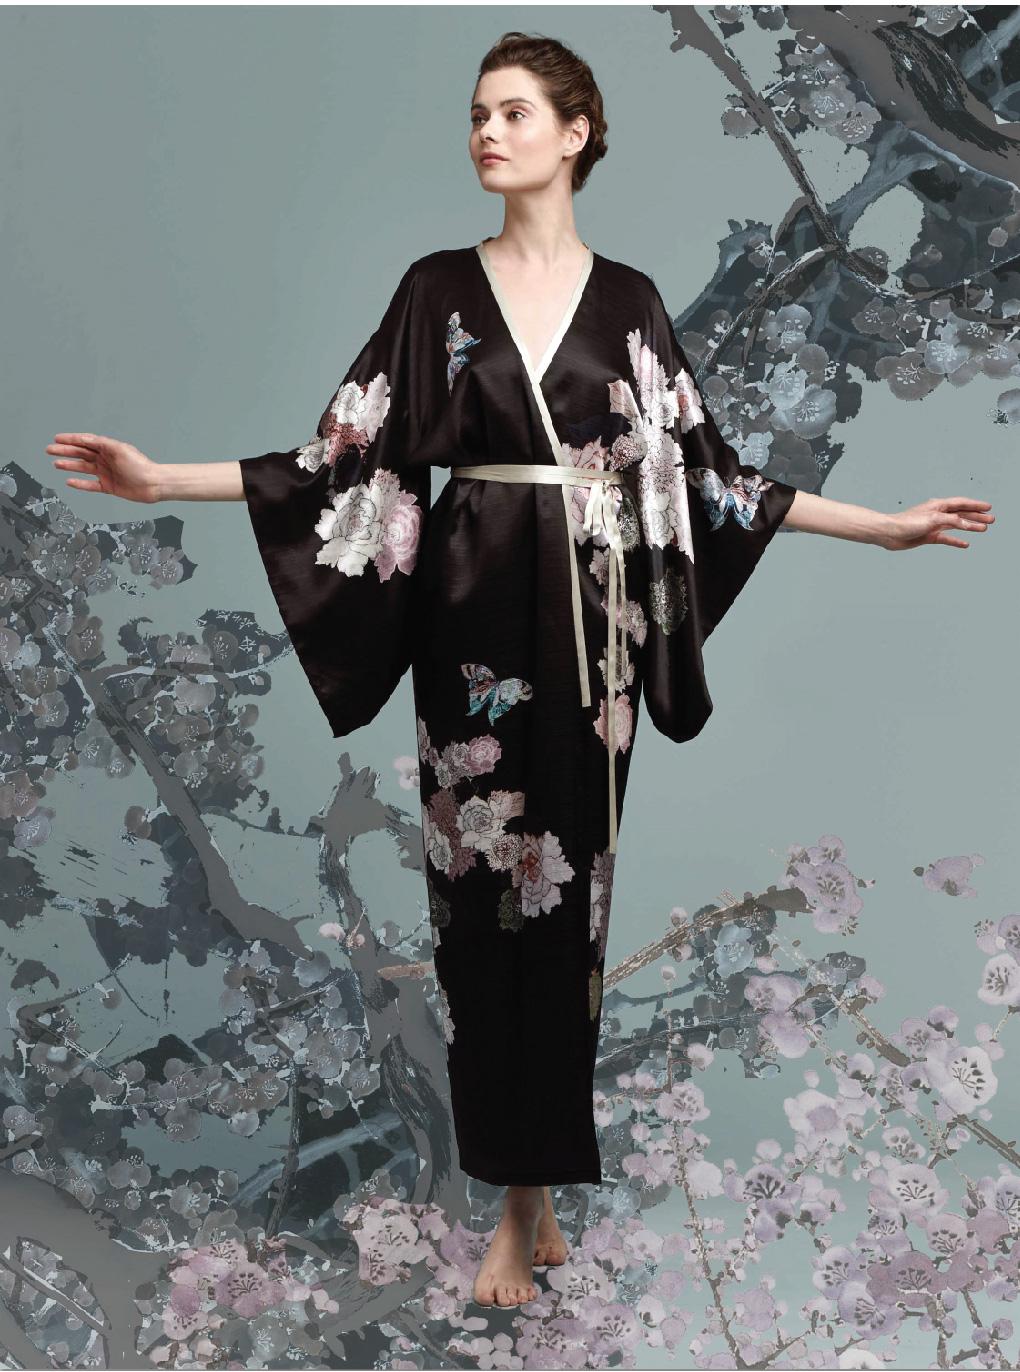 Meng-loungewear-luxury-womenswear-silk-prints-fashion-kimono-handdrawn-bloom-blossom-floral-butterfly-black-pink7.jpg